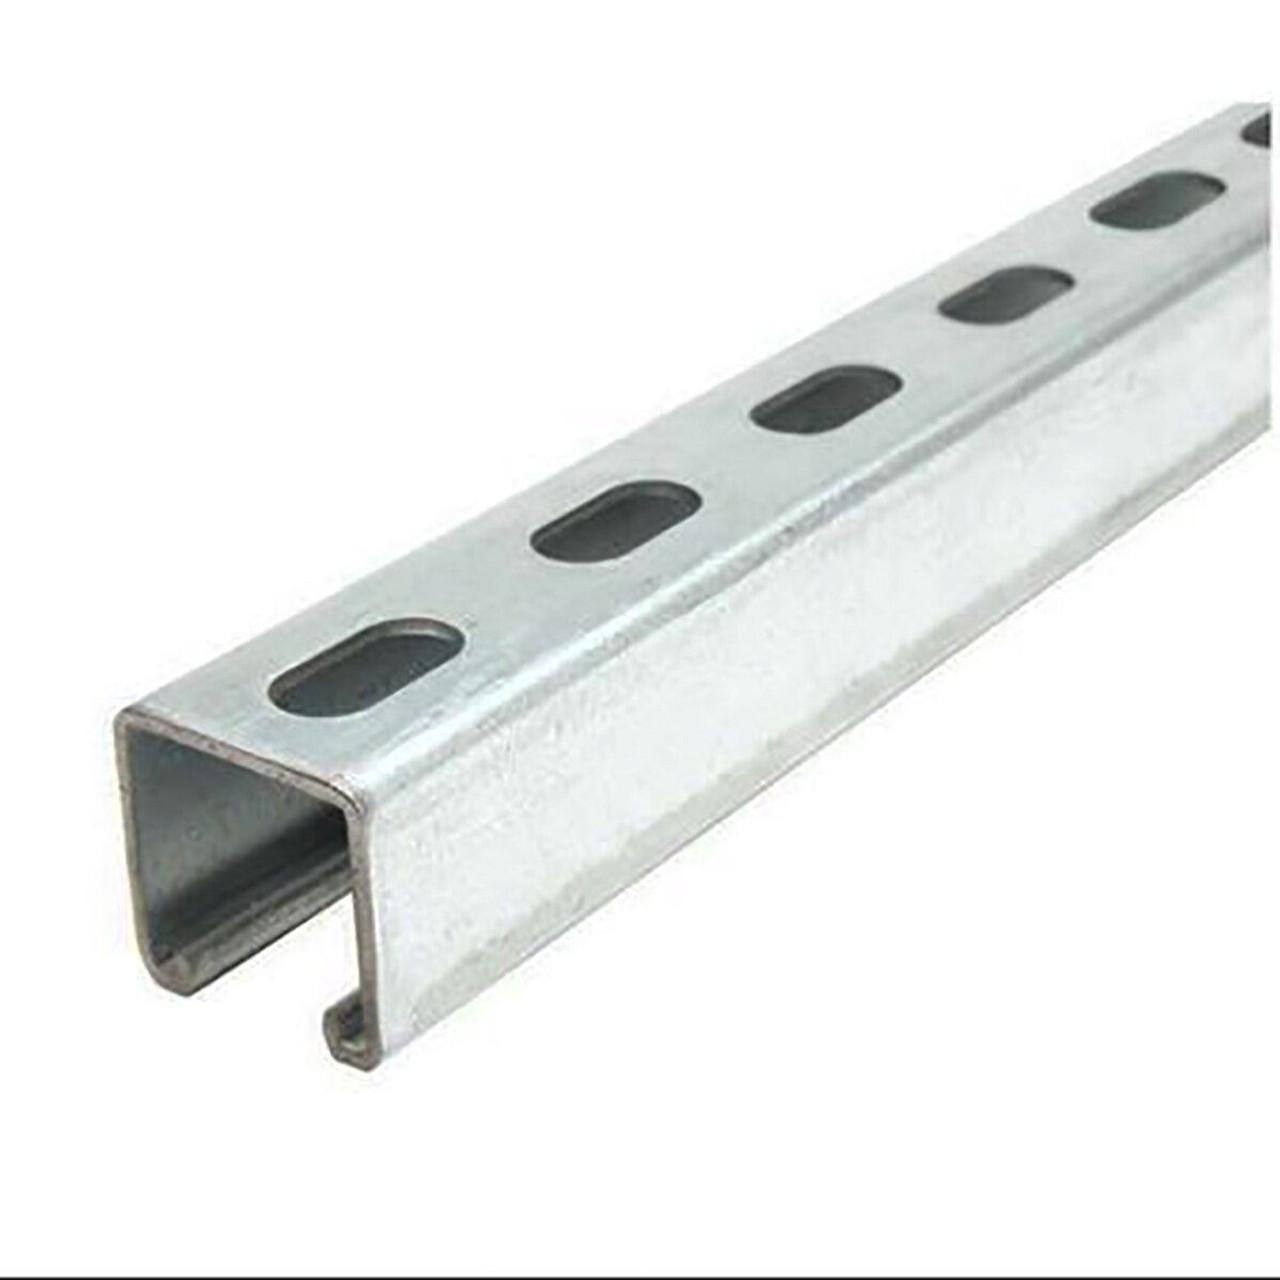 "Galvanized Steel, Half Slotted Strut Channel, 1-3/8"" x 1-5/8"", 24 inches, 12 ga."